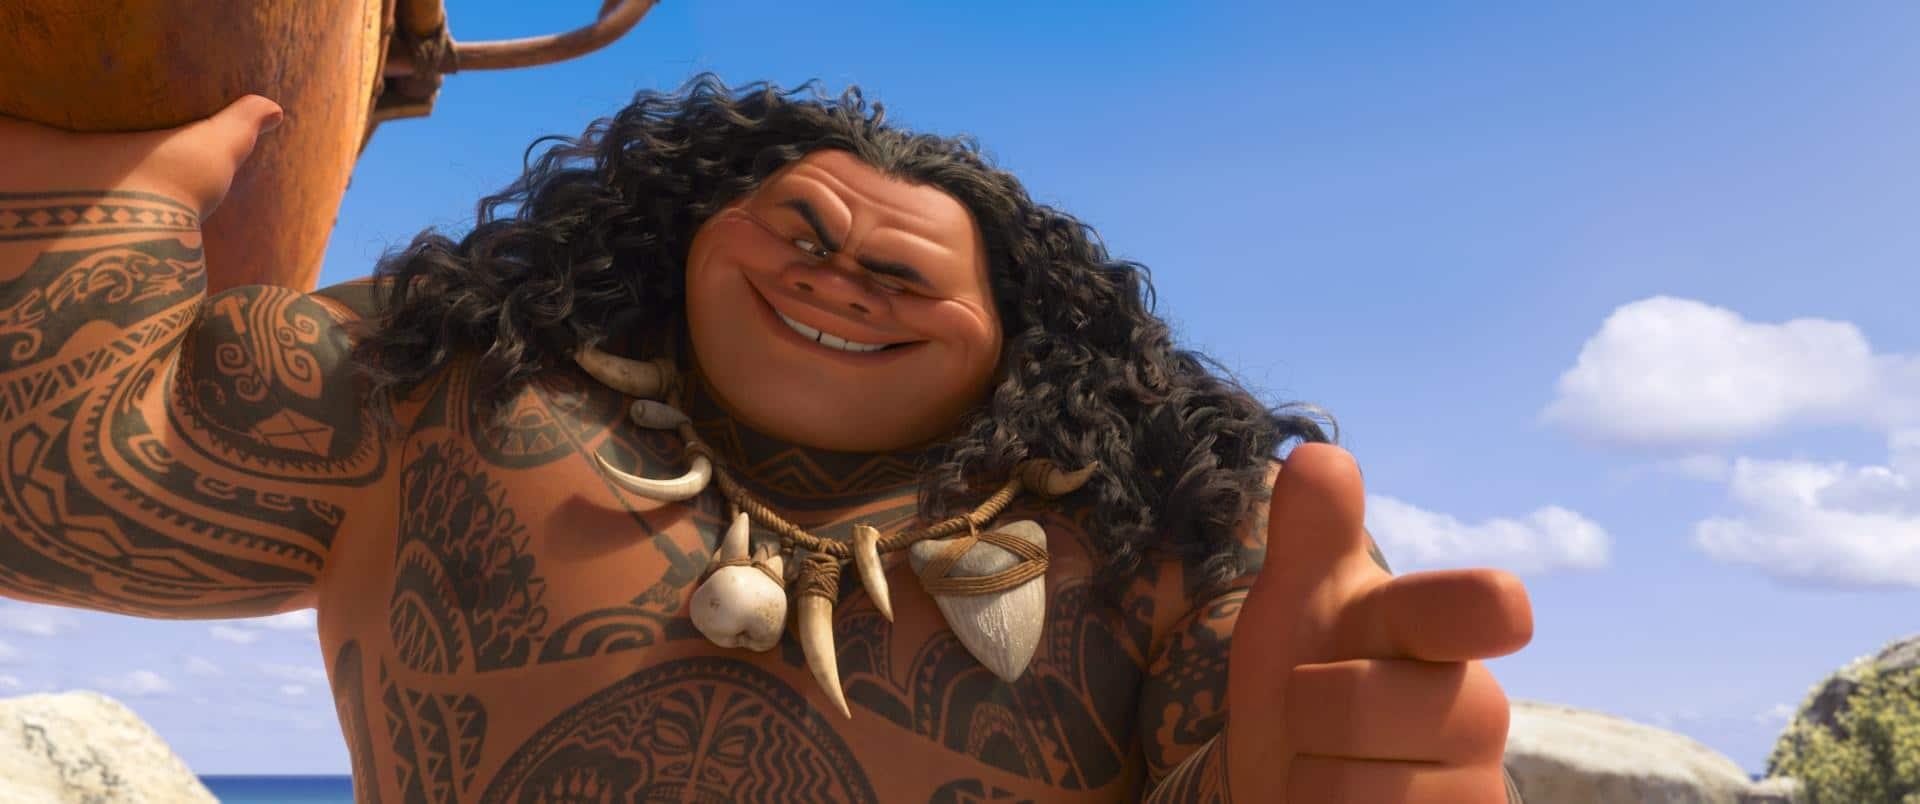 Oceania: Maui e l'infanzia del narcisista | Dipendiamo.blog